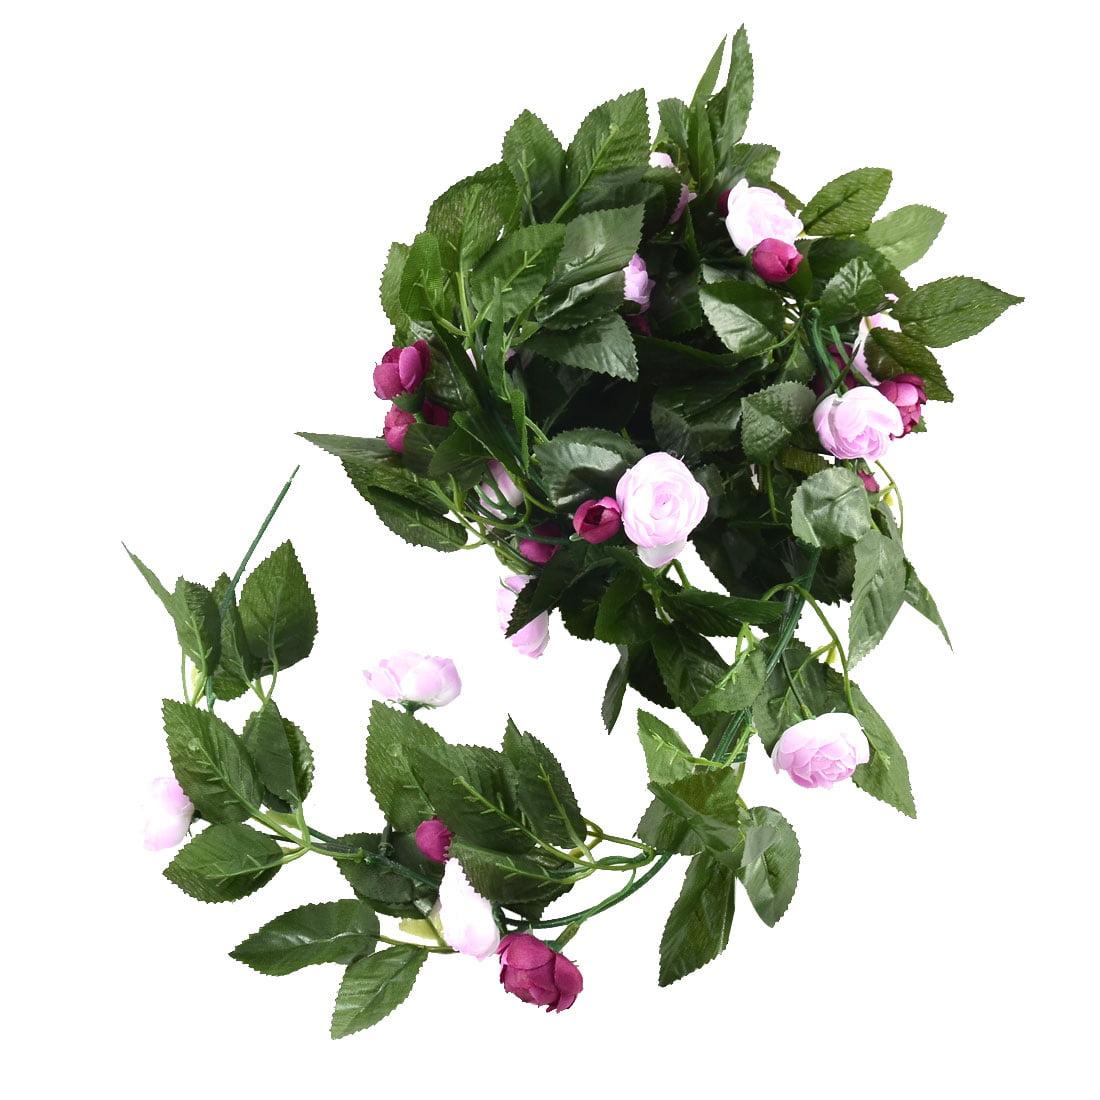 Home Wedding Part Festival Decor Artificial Flower Hanging Vine - image 2 of 2